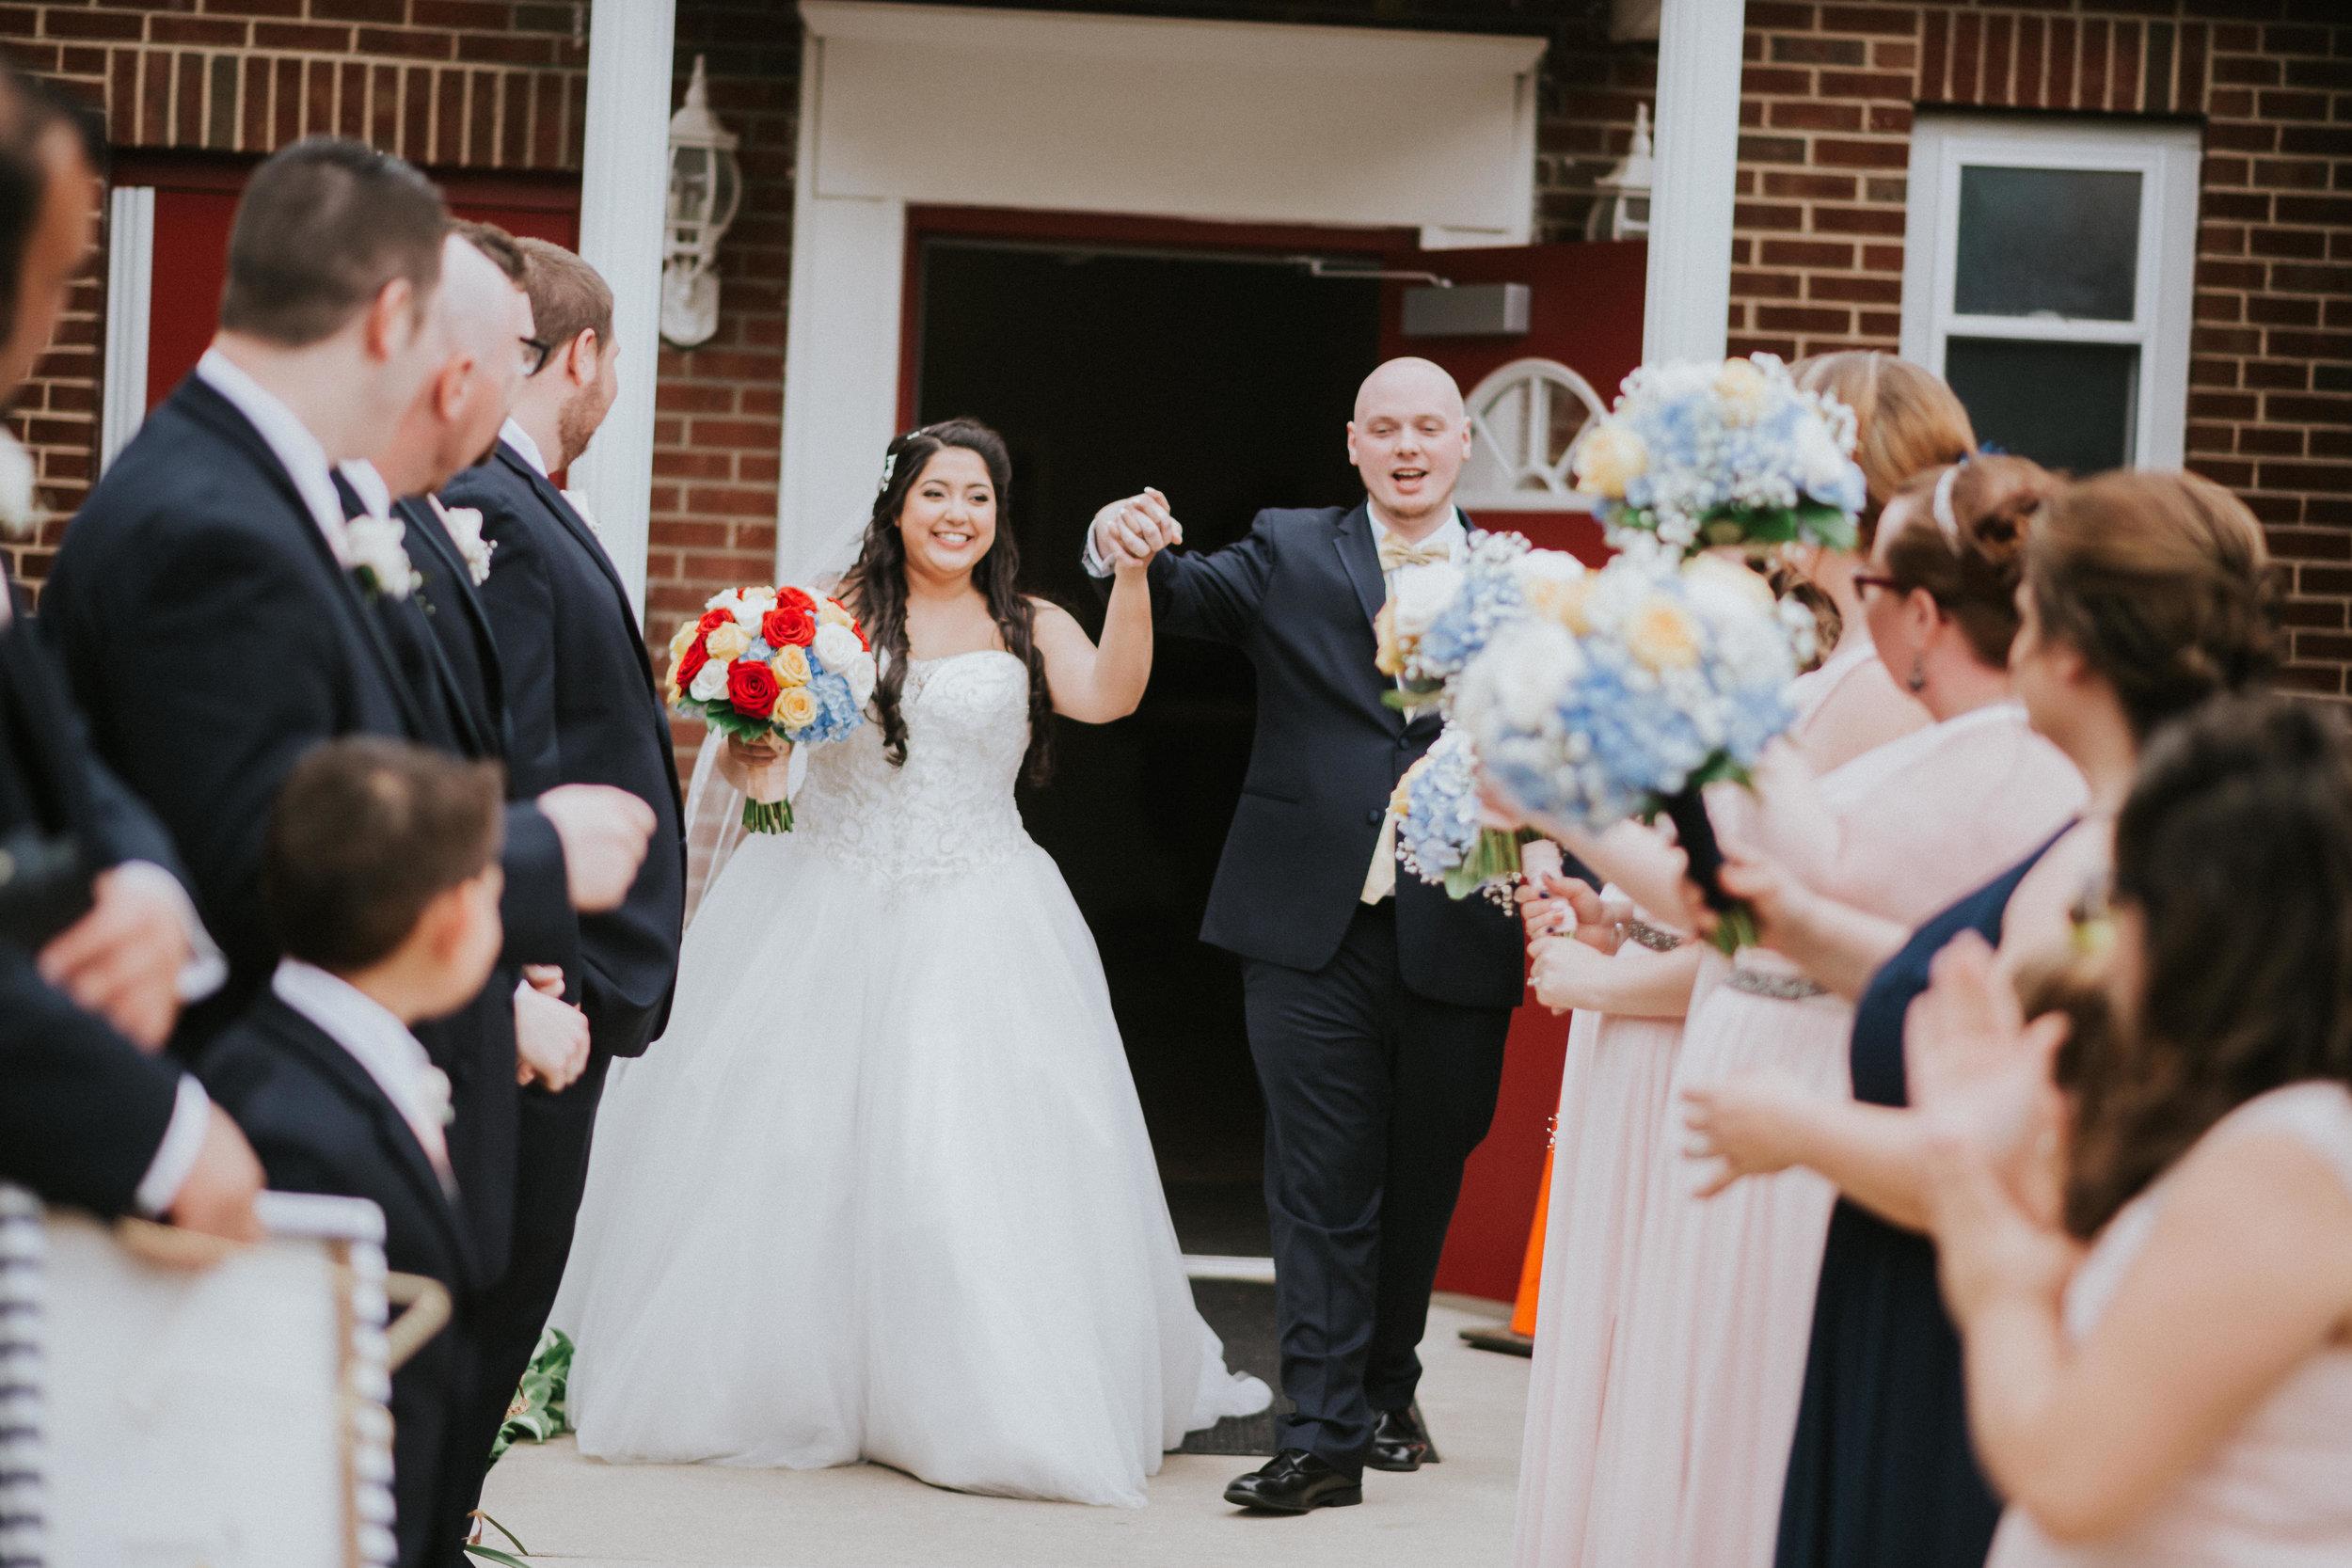 Barclay-Farmstead-Wedding-Rosa-and-Mike-334.jpg